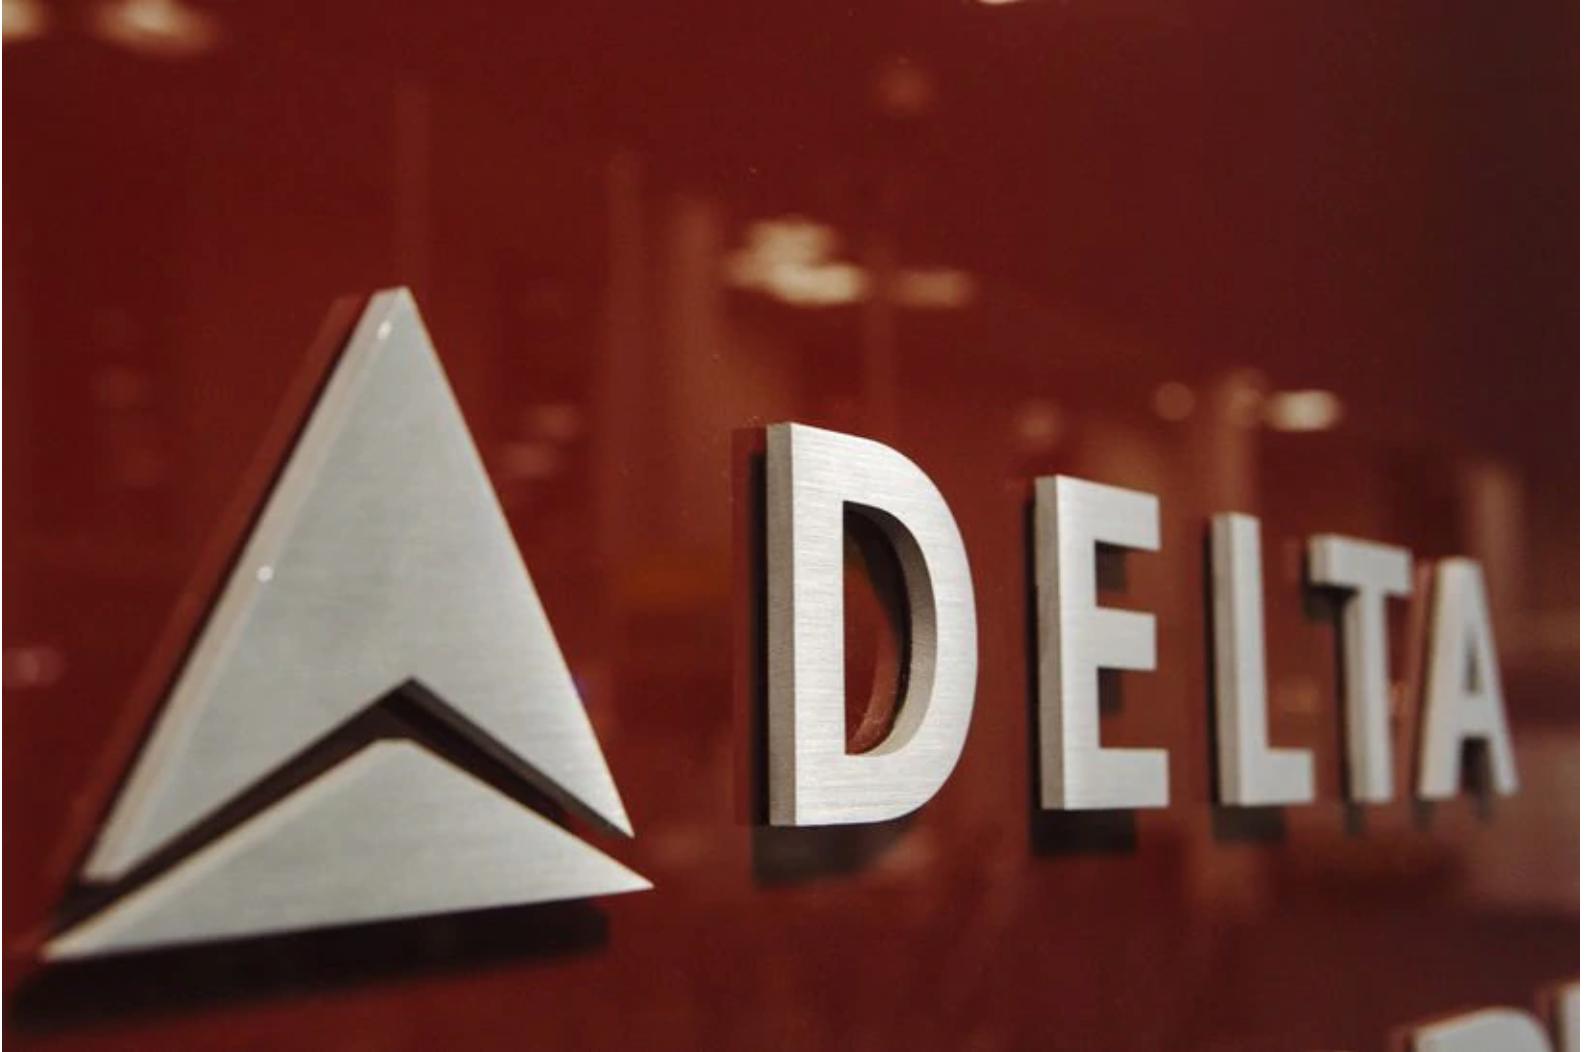 logo for Delta Airline